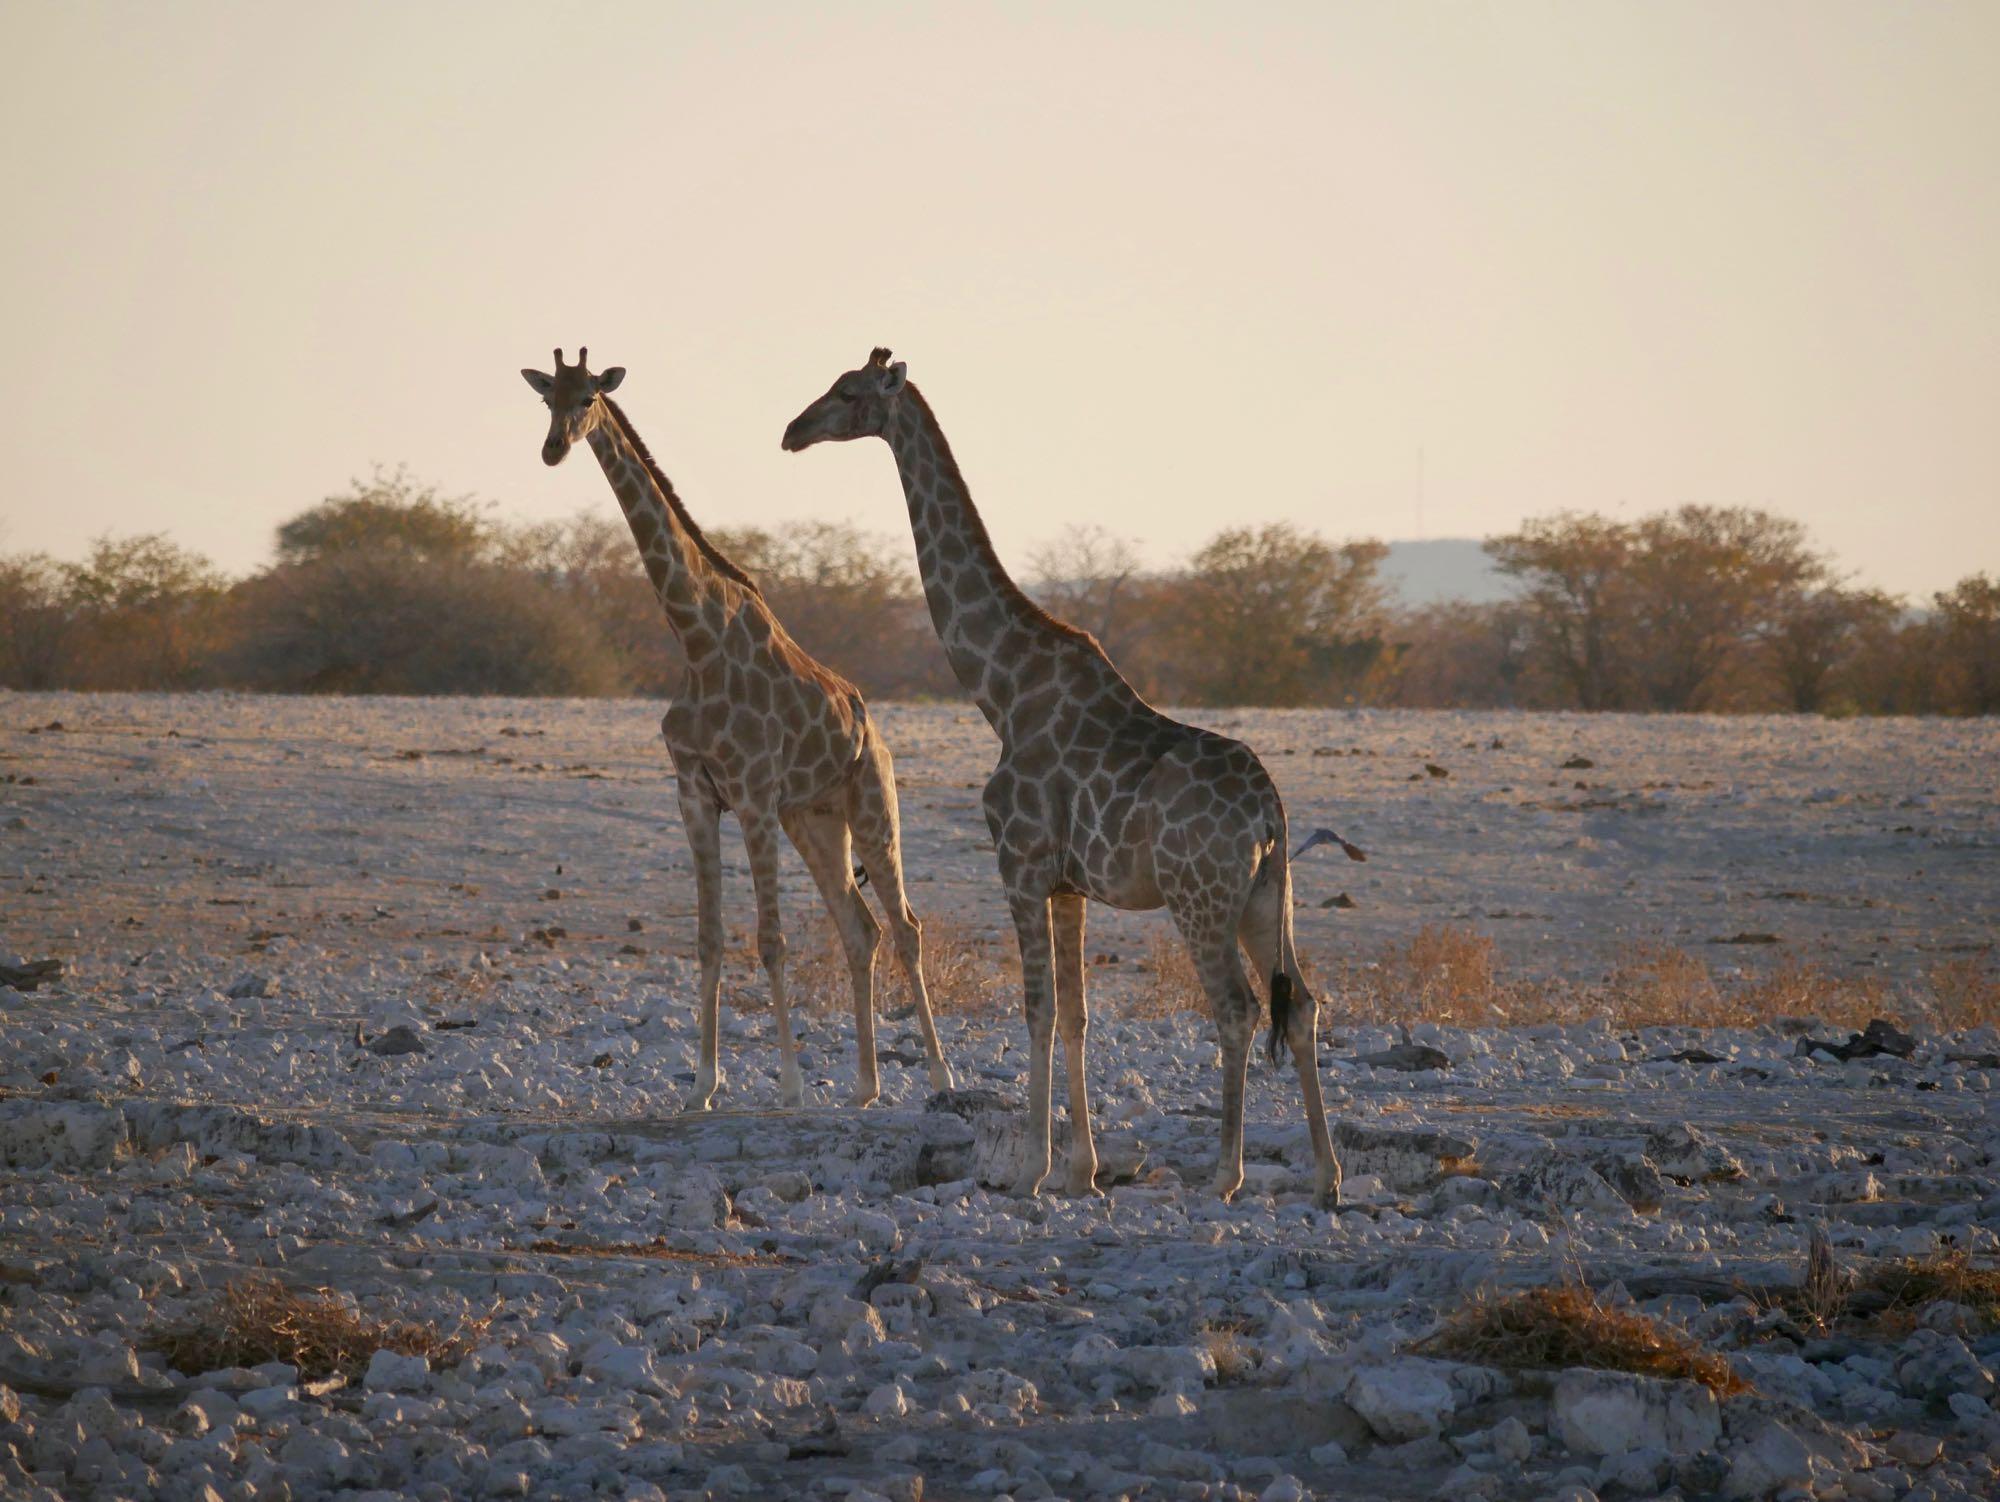 Deux girafes au coucher du soleil à Etosha